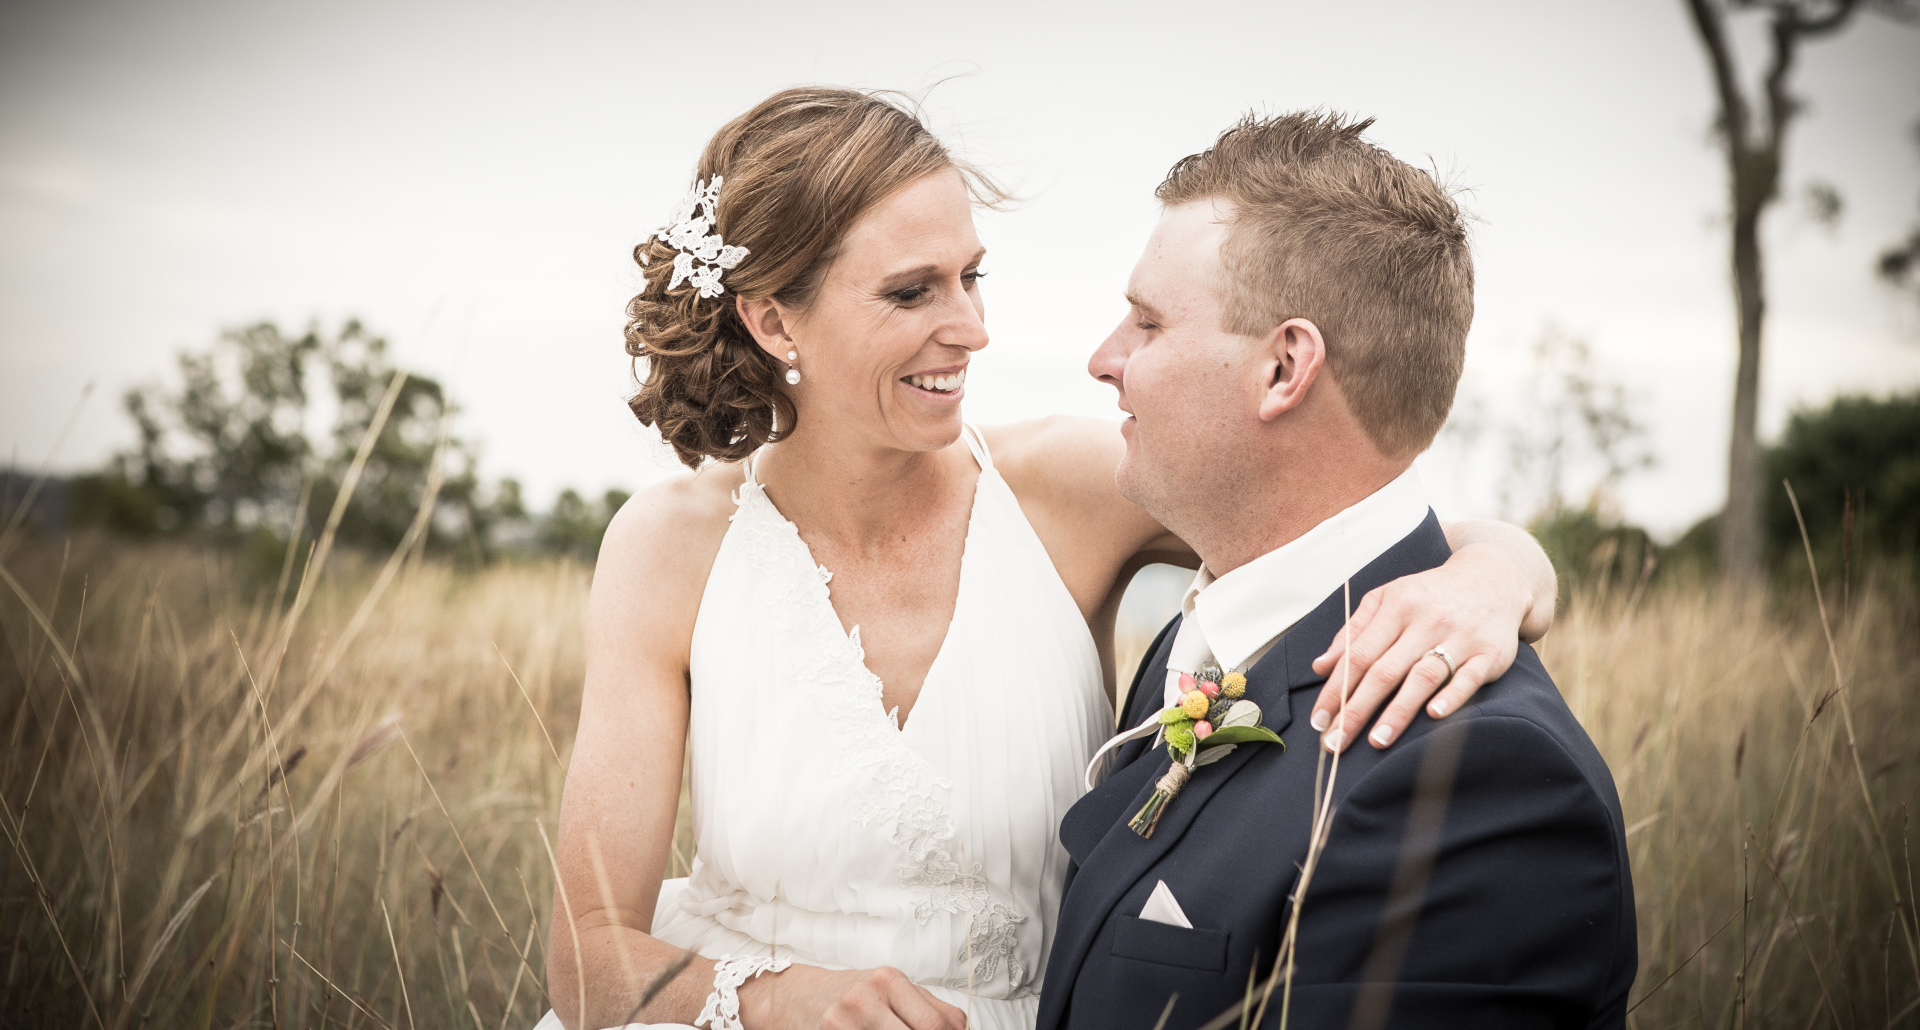 Allister & Jodi   Toowoomba Surrounds   Toowoomba Wedding Photographer